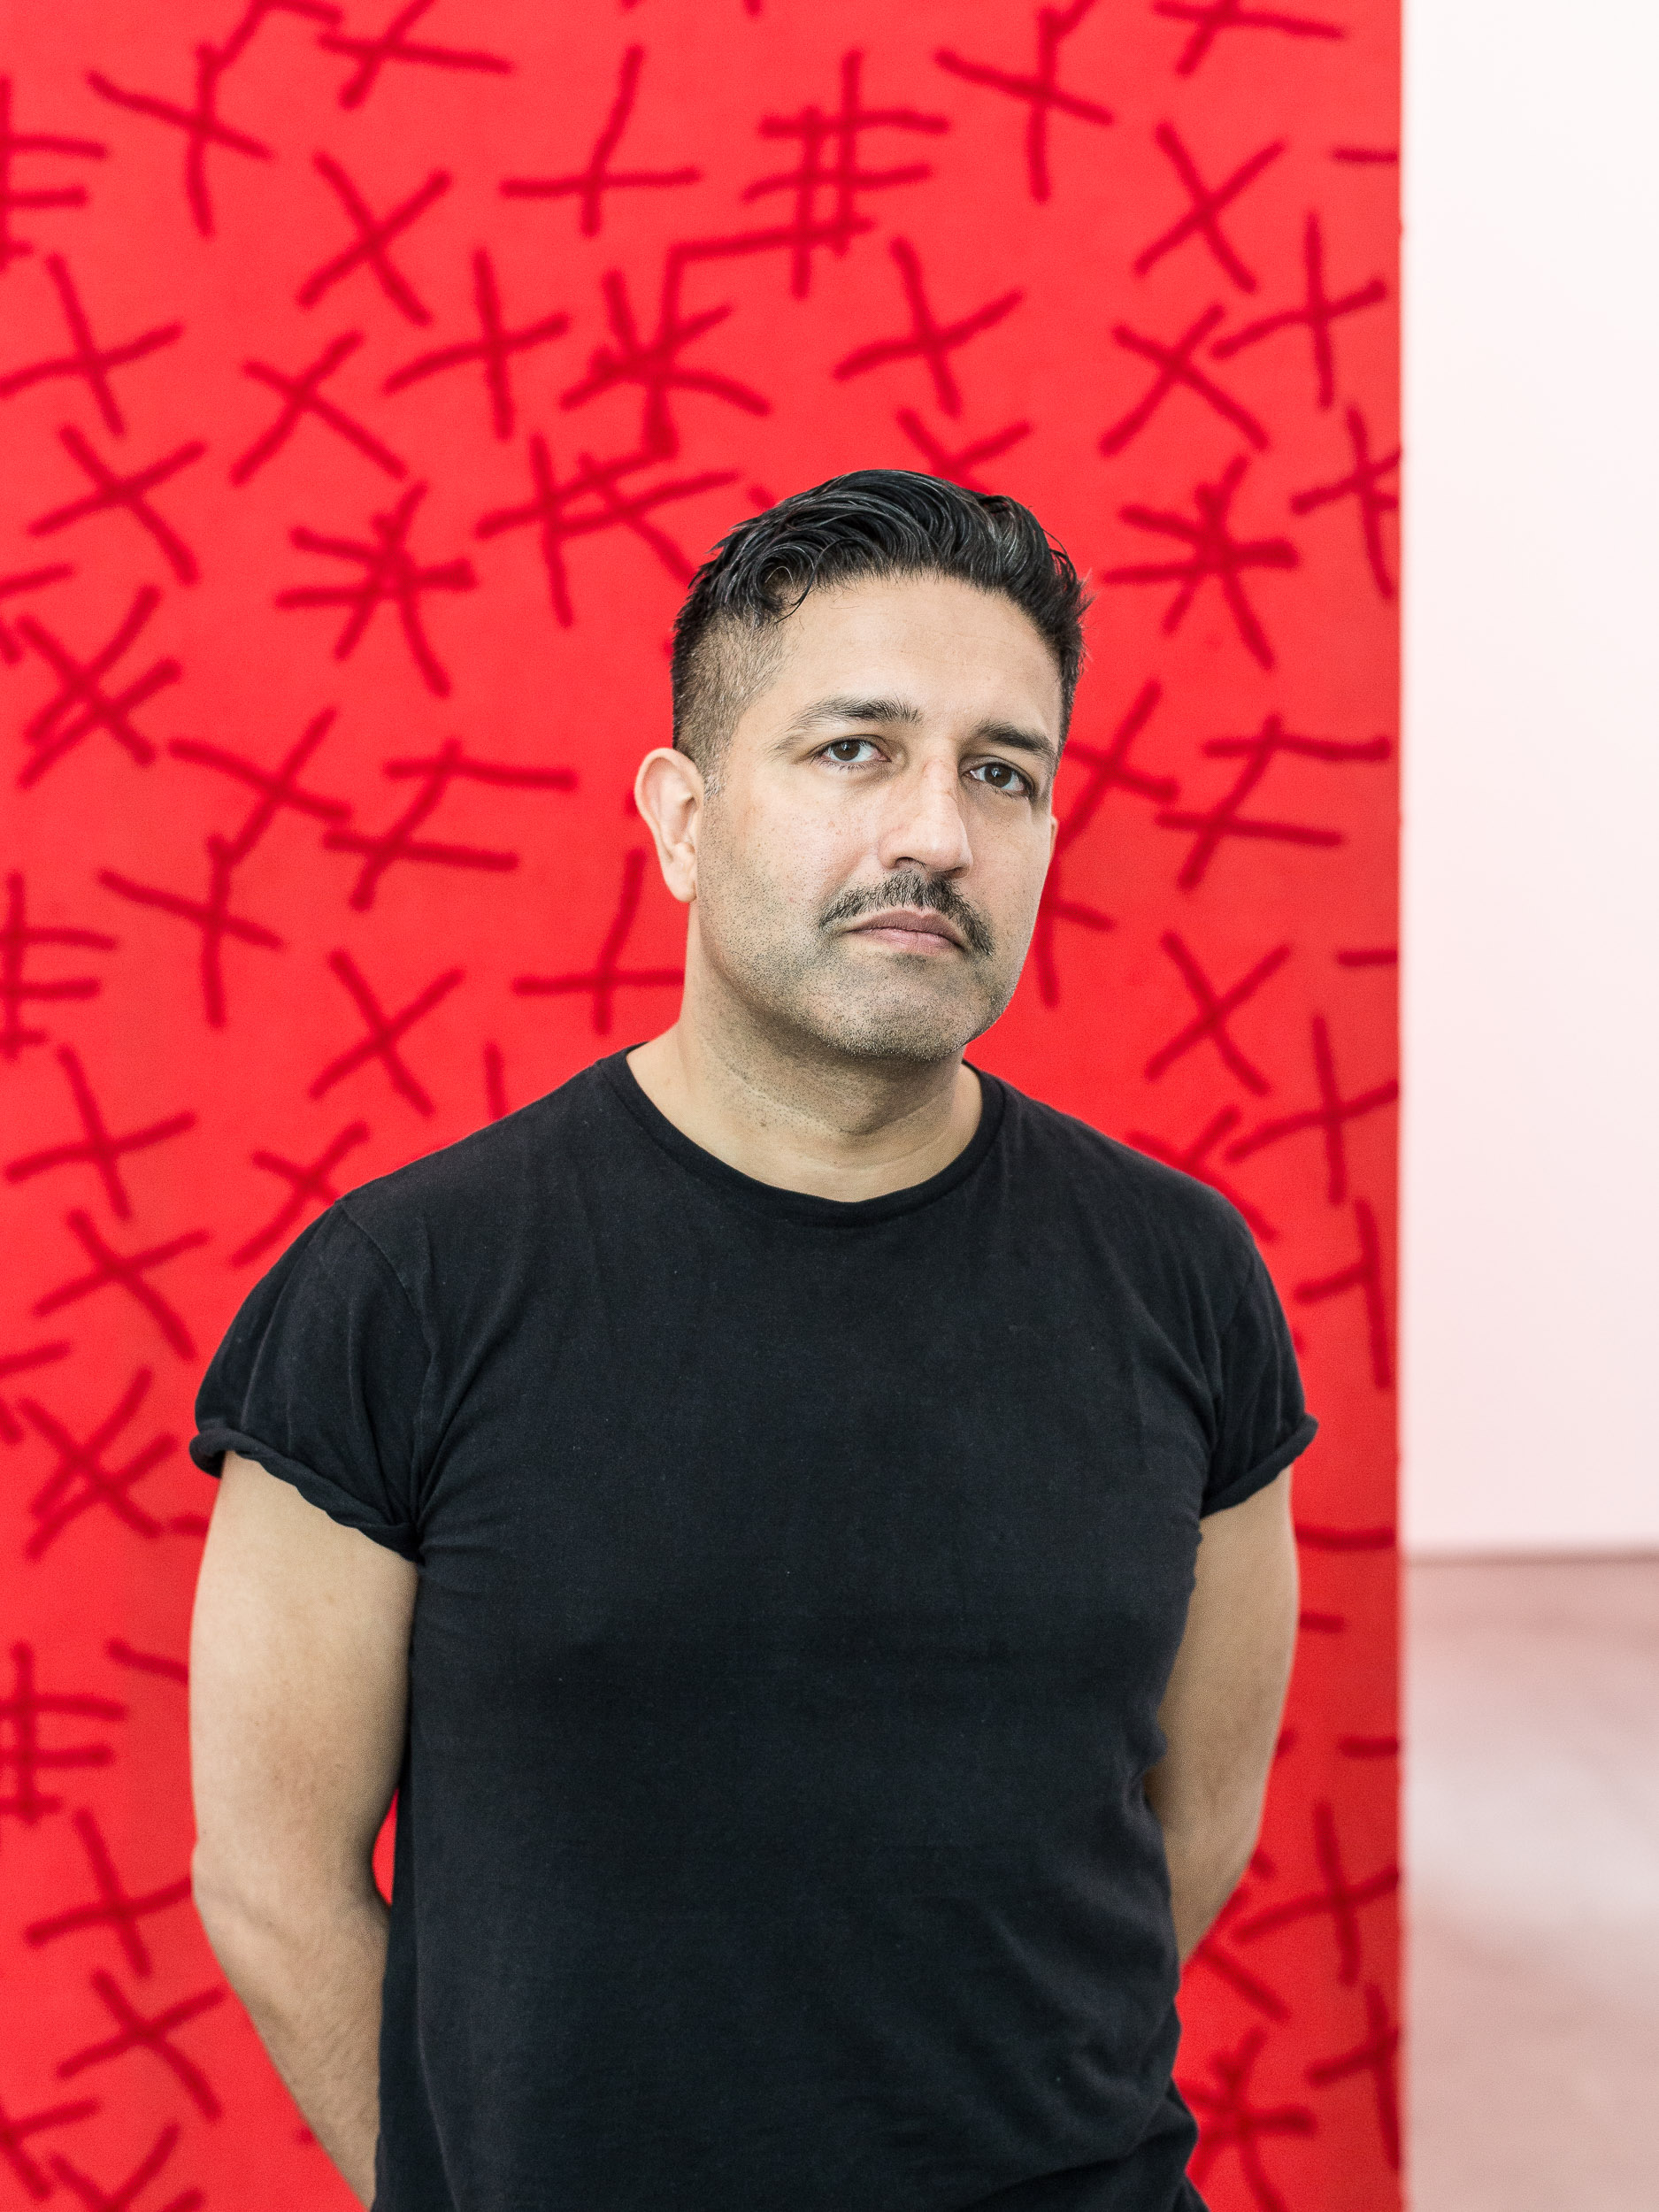 Osman Yousefzada at Ikon Gallery8.jpg